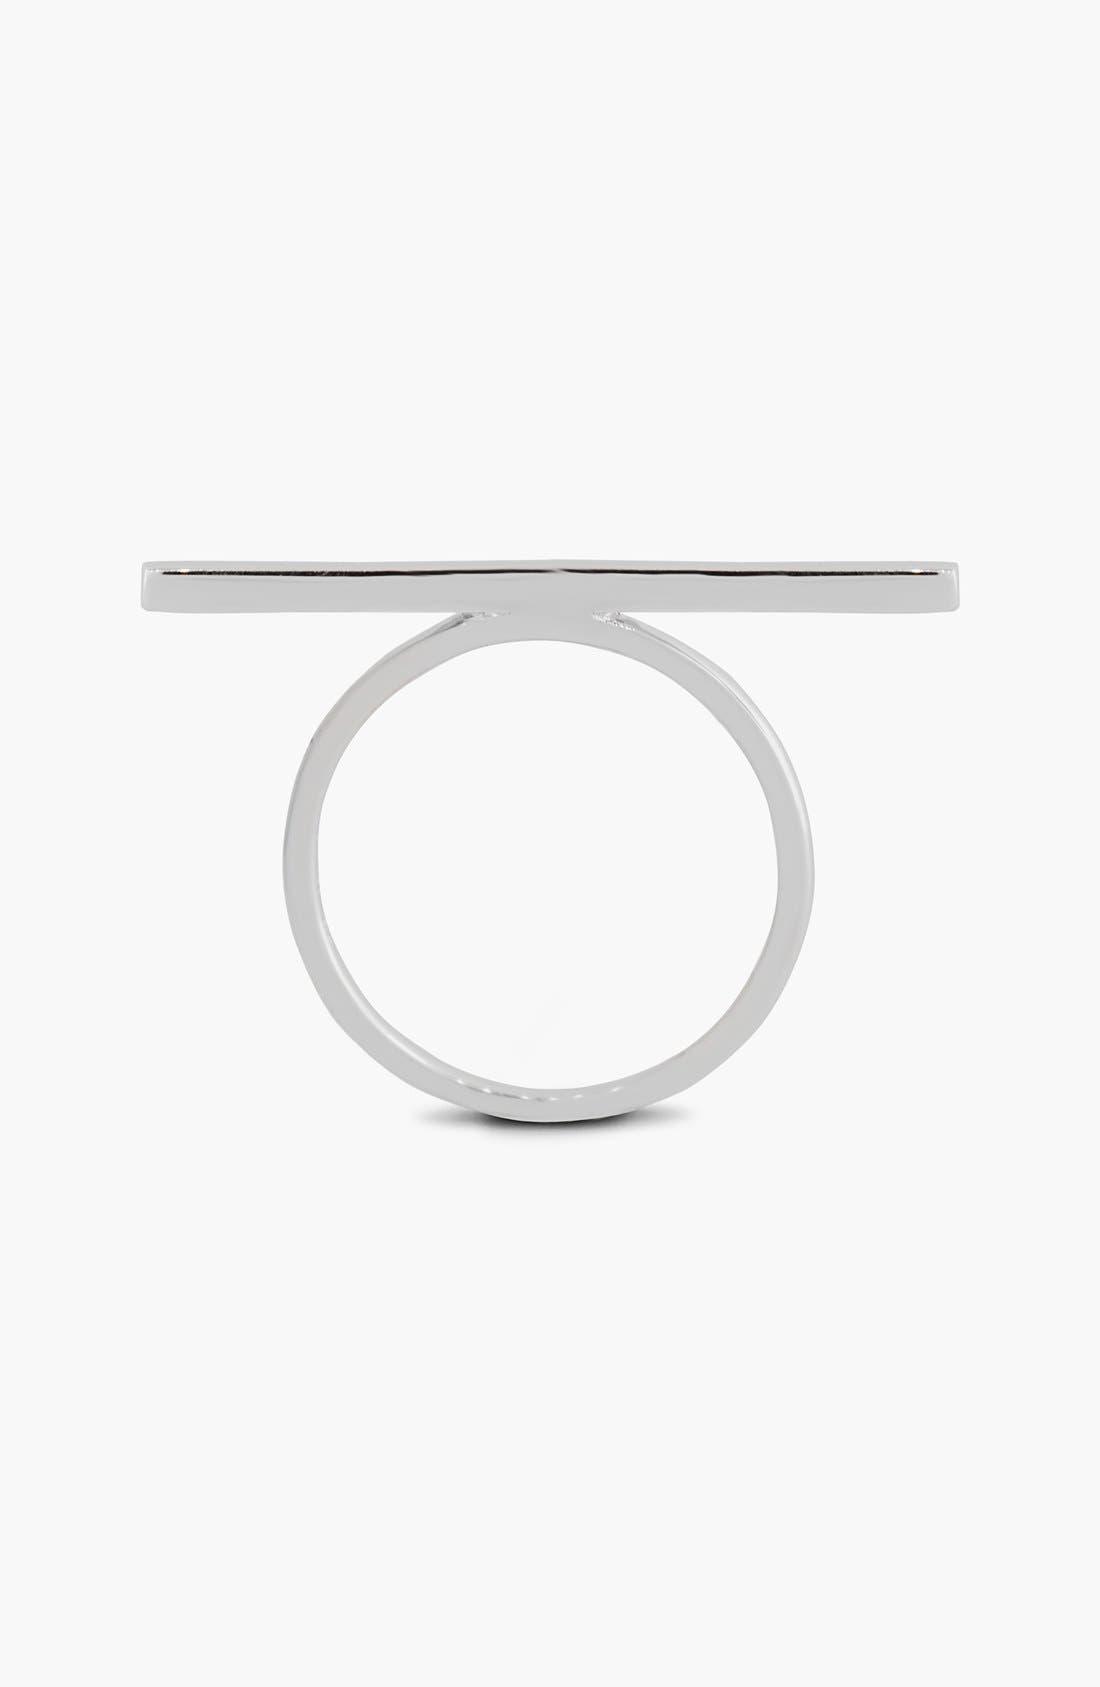 14KT Bar Ring,                             Alternate thumbnail 2, color,                             710